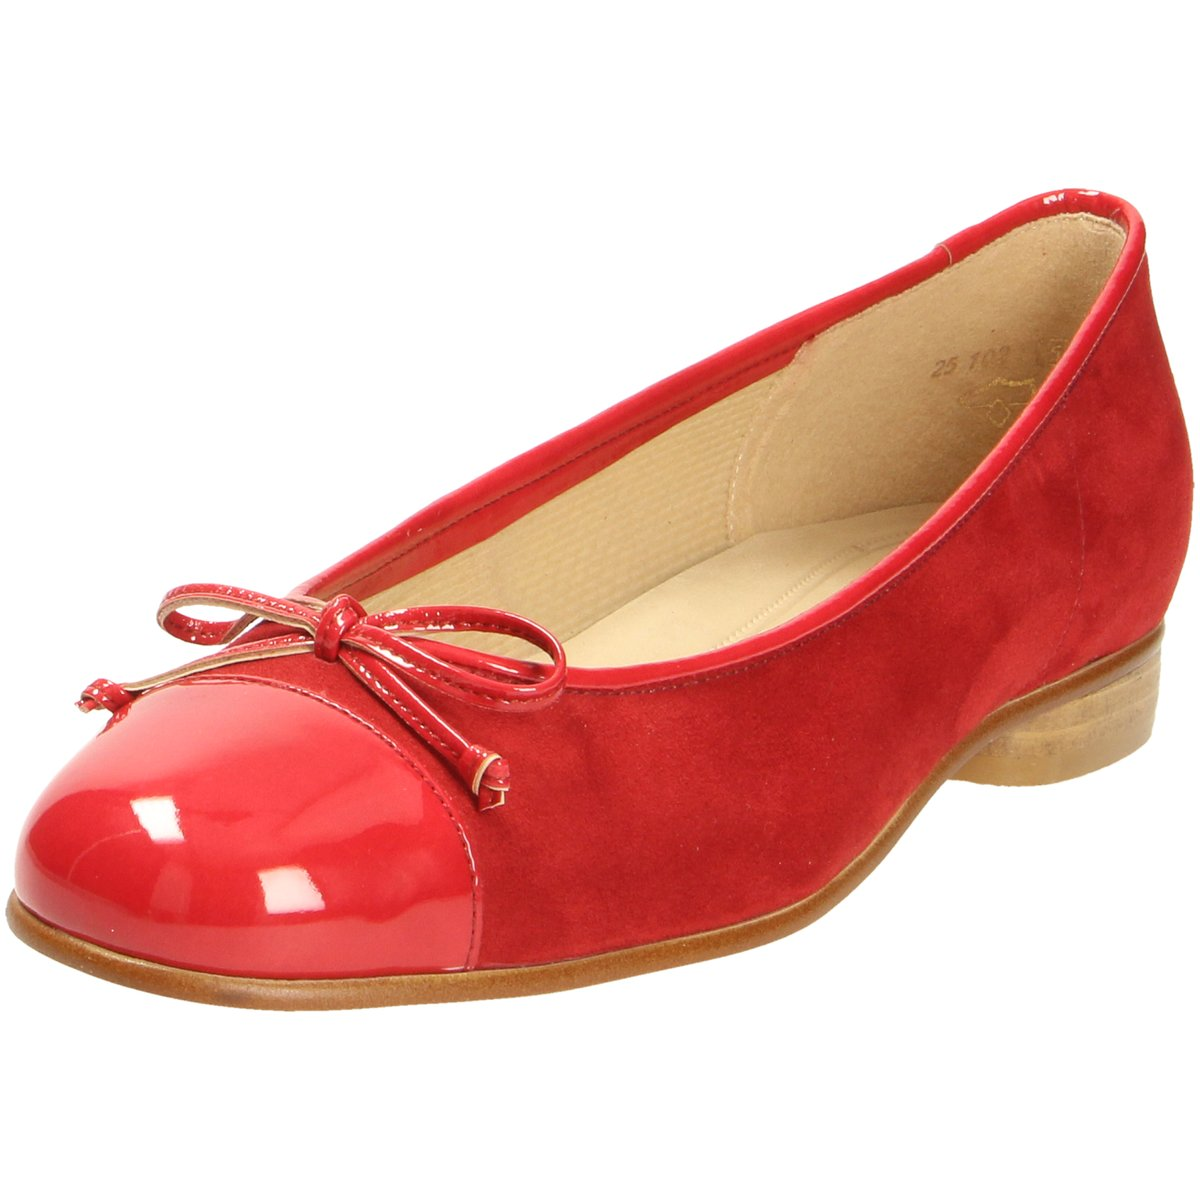 Details zu Buffalo Damenschuhe Schuhe Stiefel Stiefelette Boots 332229